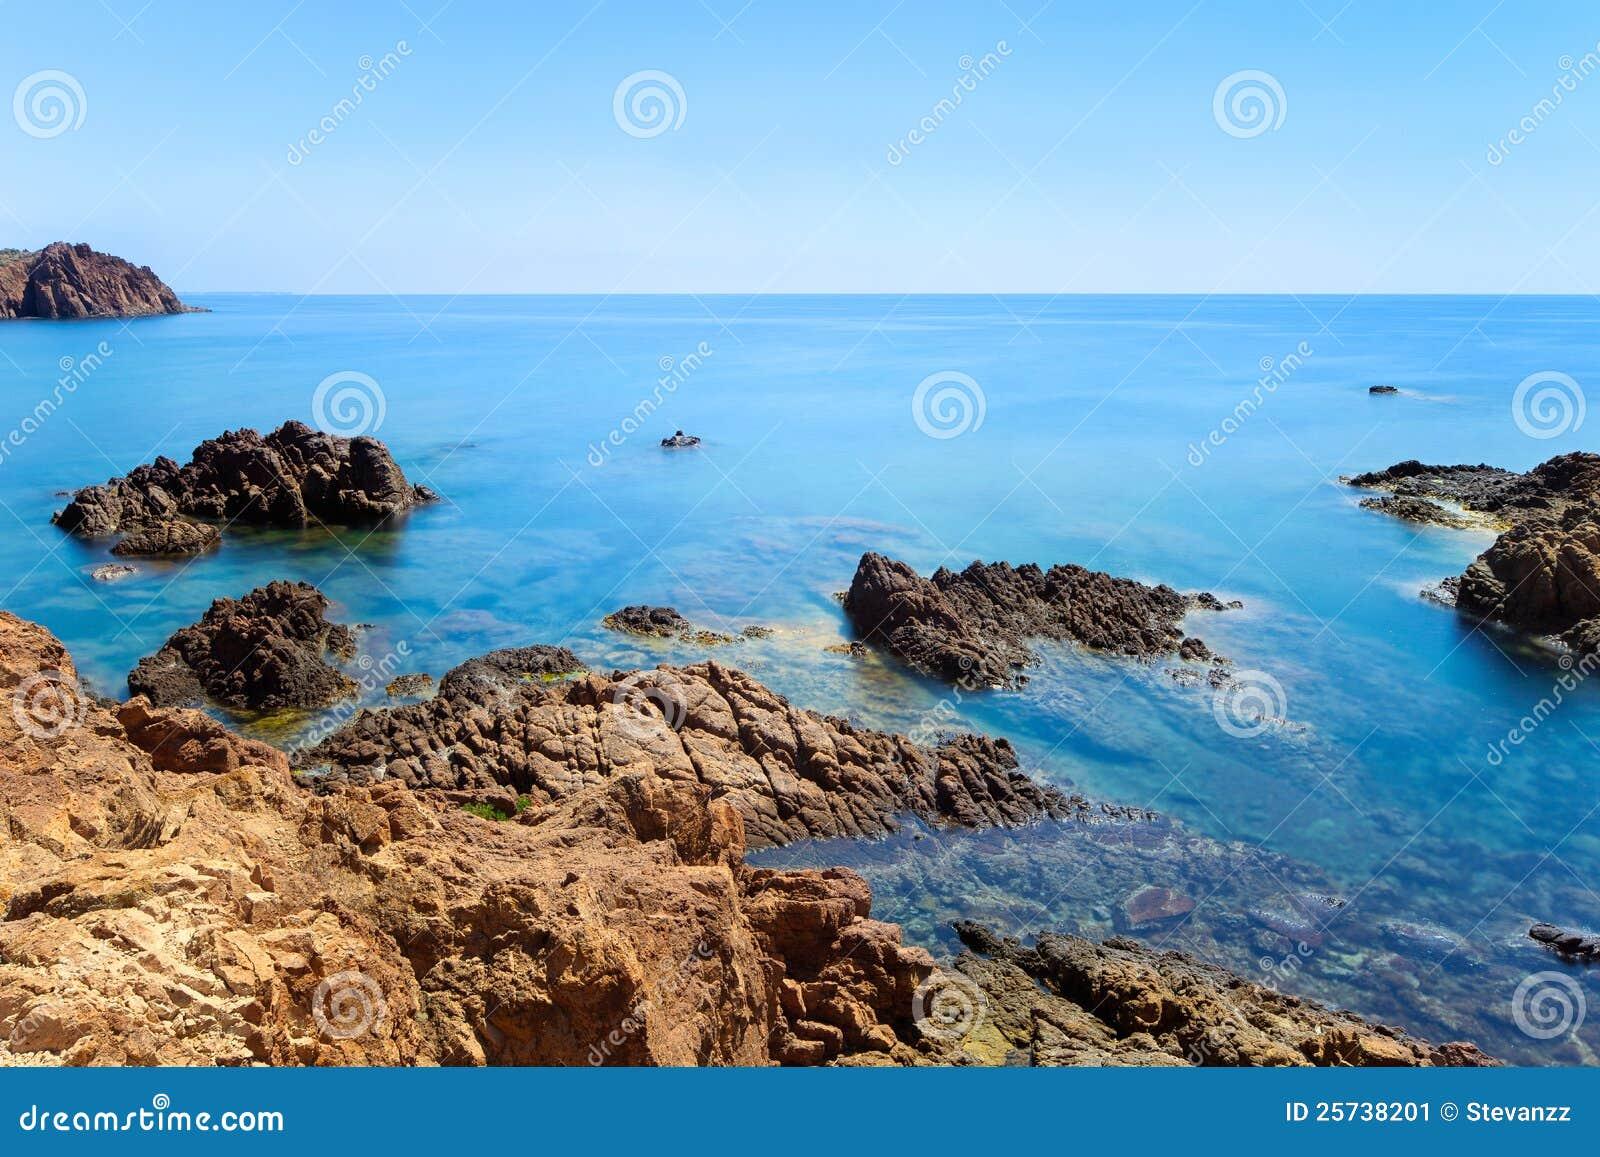 Esterel rock coast. Cote Azur, Provence, France.